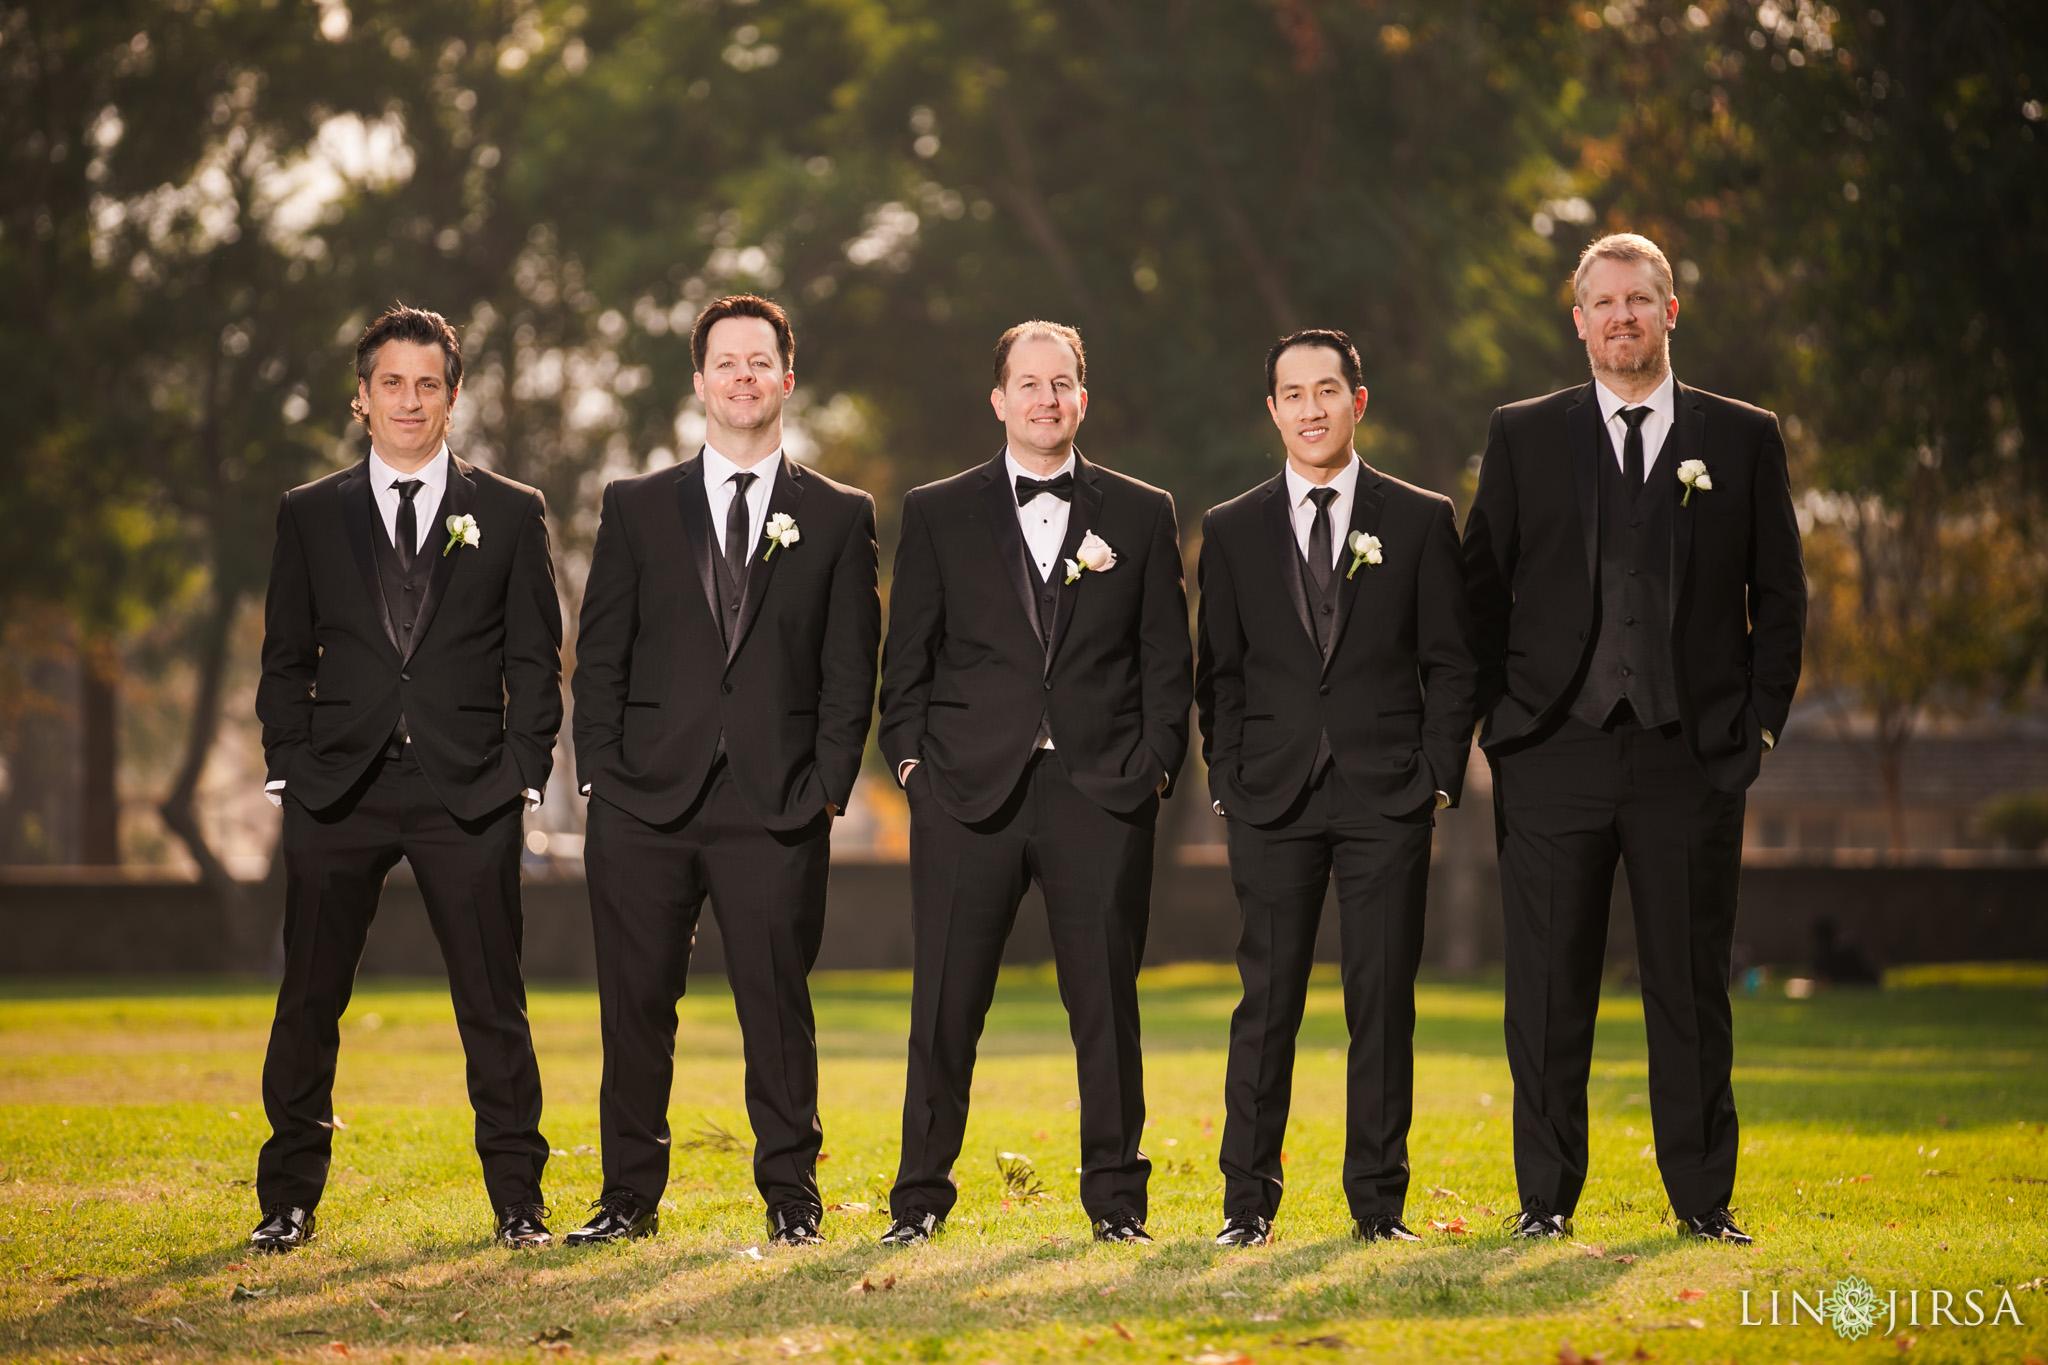 18 vertigo banquet hall glendale wedding photography